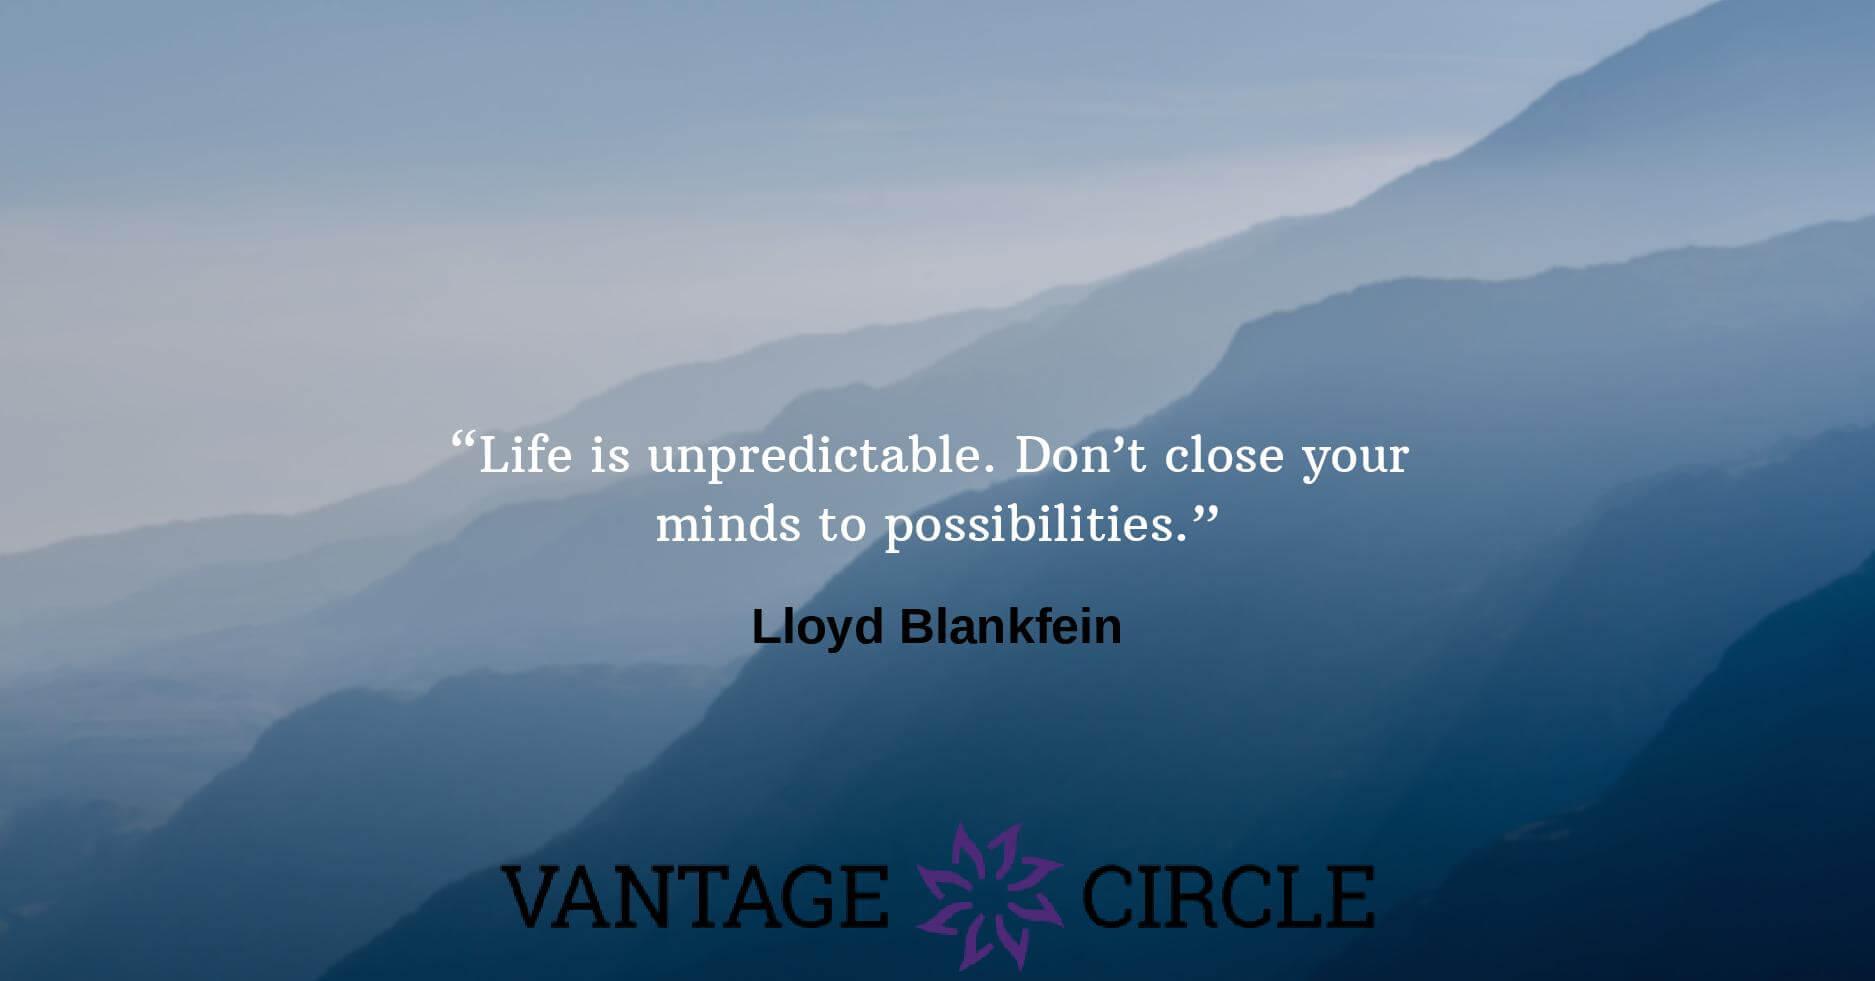 Employee-motivational-quotes-Lloyd-Blankfein